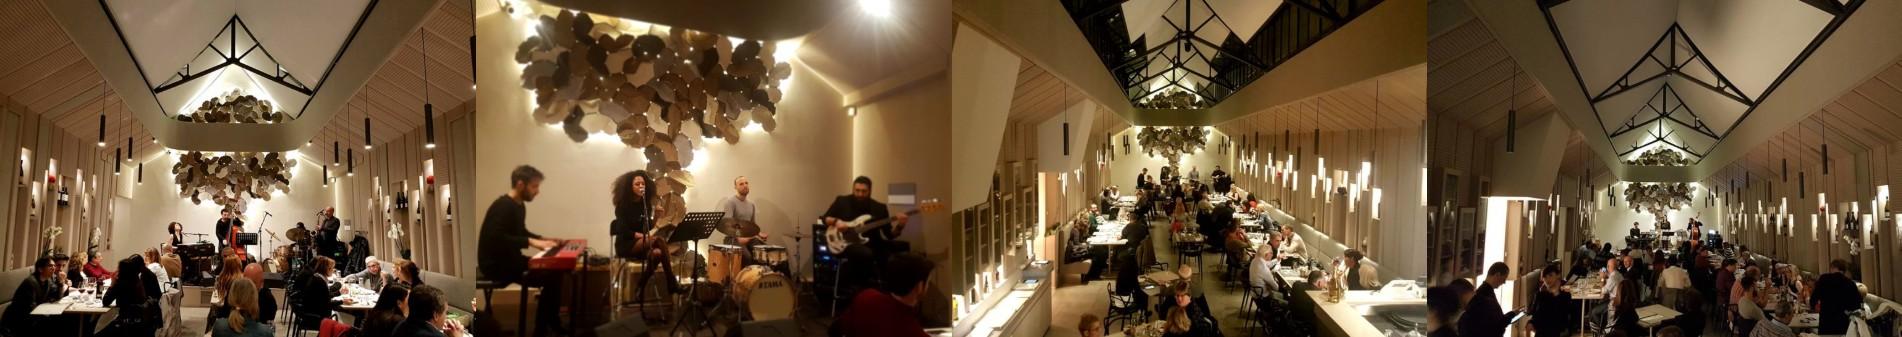 interni hangout cafe roma